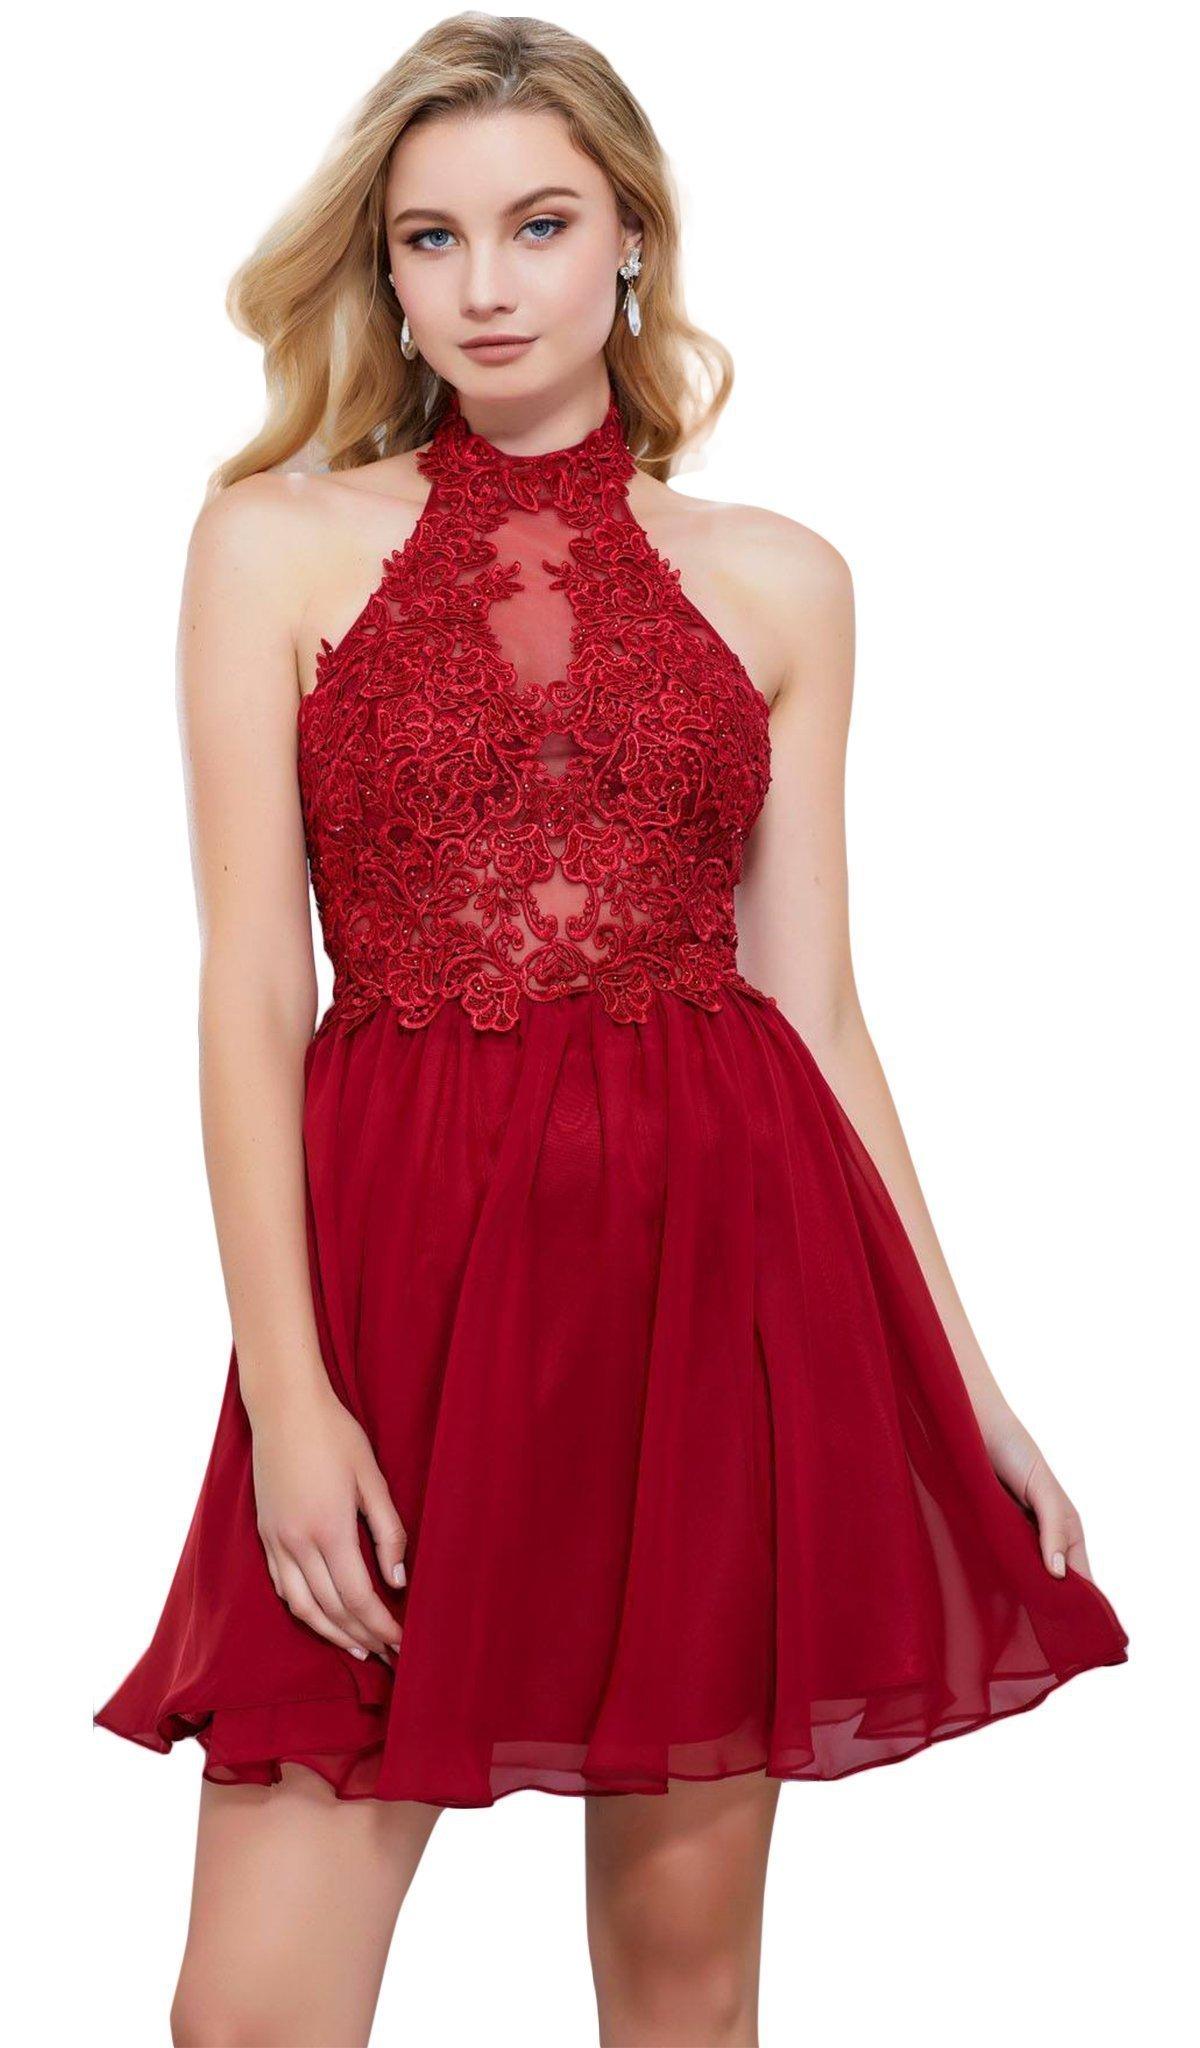 Nox Anabel - 6308 Ornate Lace Appliqued Illusion Halter Dress